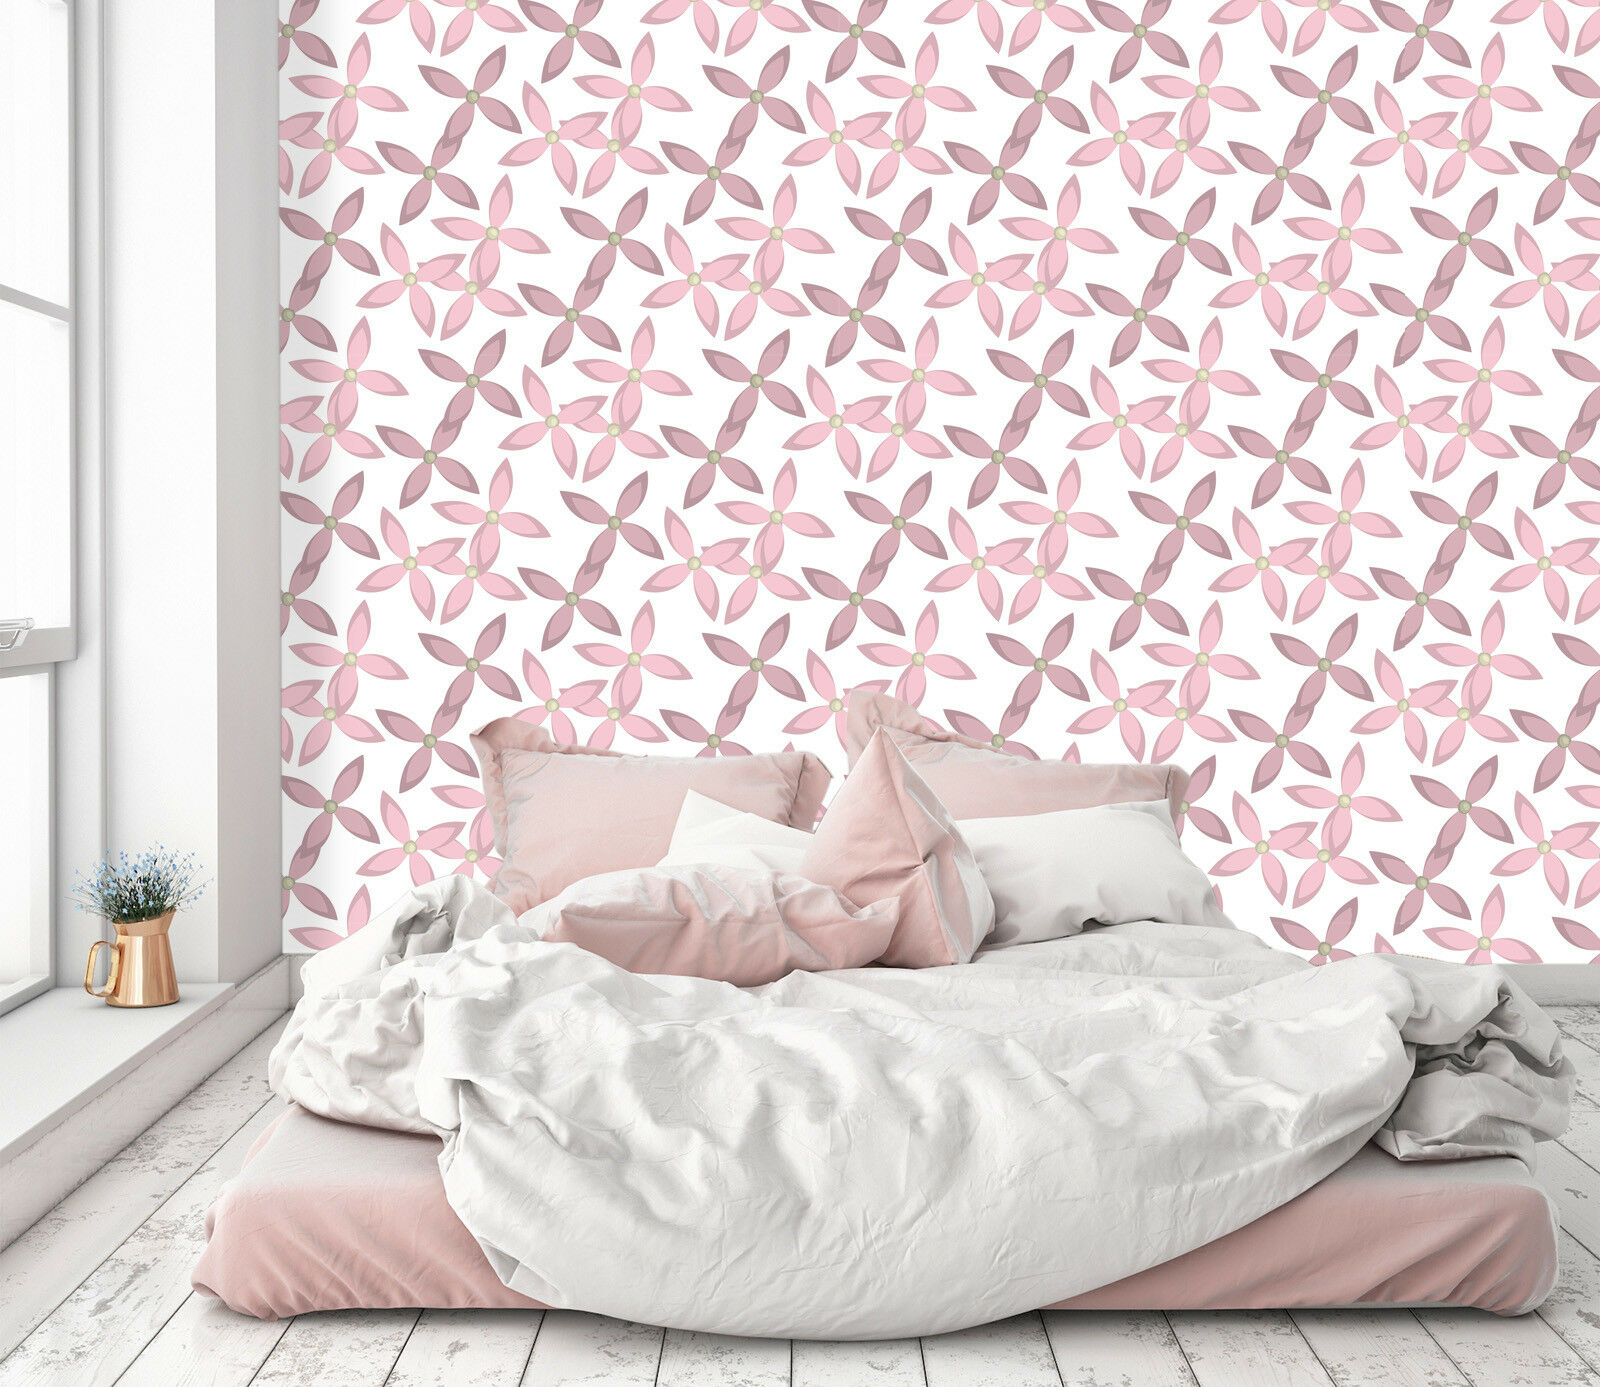 3D Pink Petal Art 2 Wallpaper Mural Print Wall Indoor Wallpaper Murals UK Summer